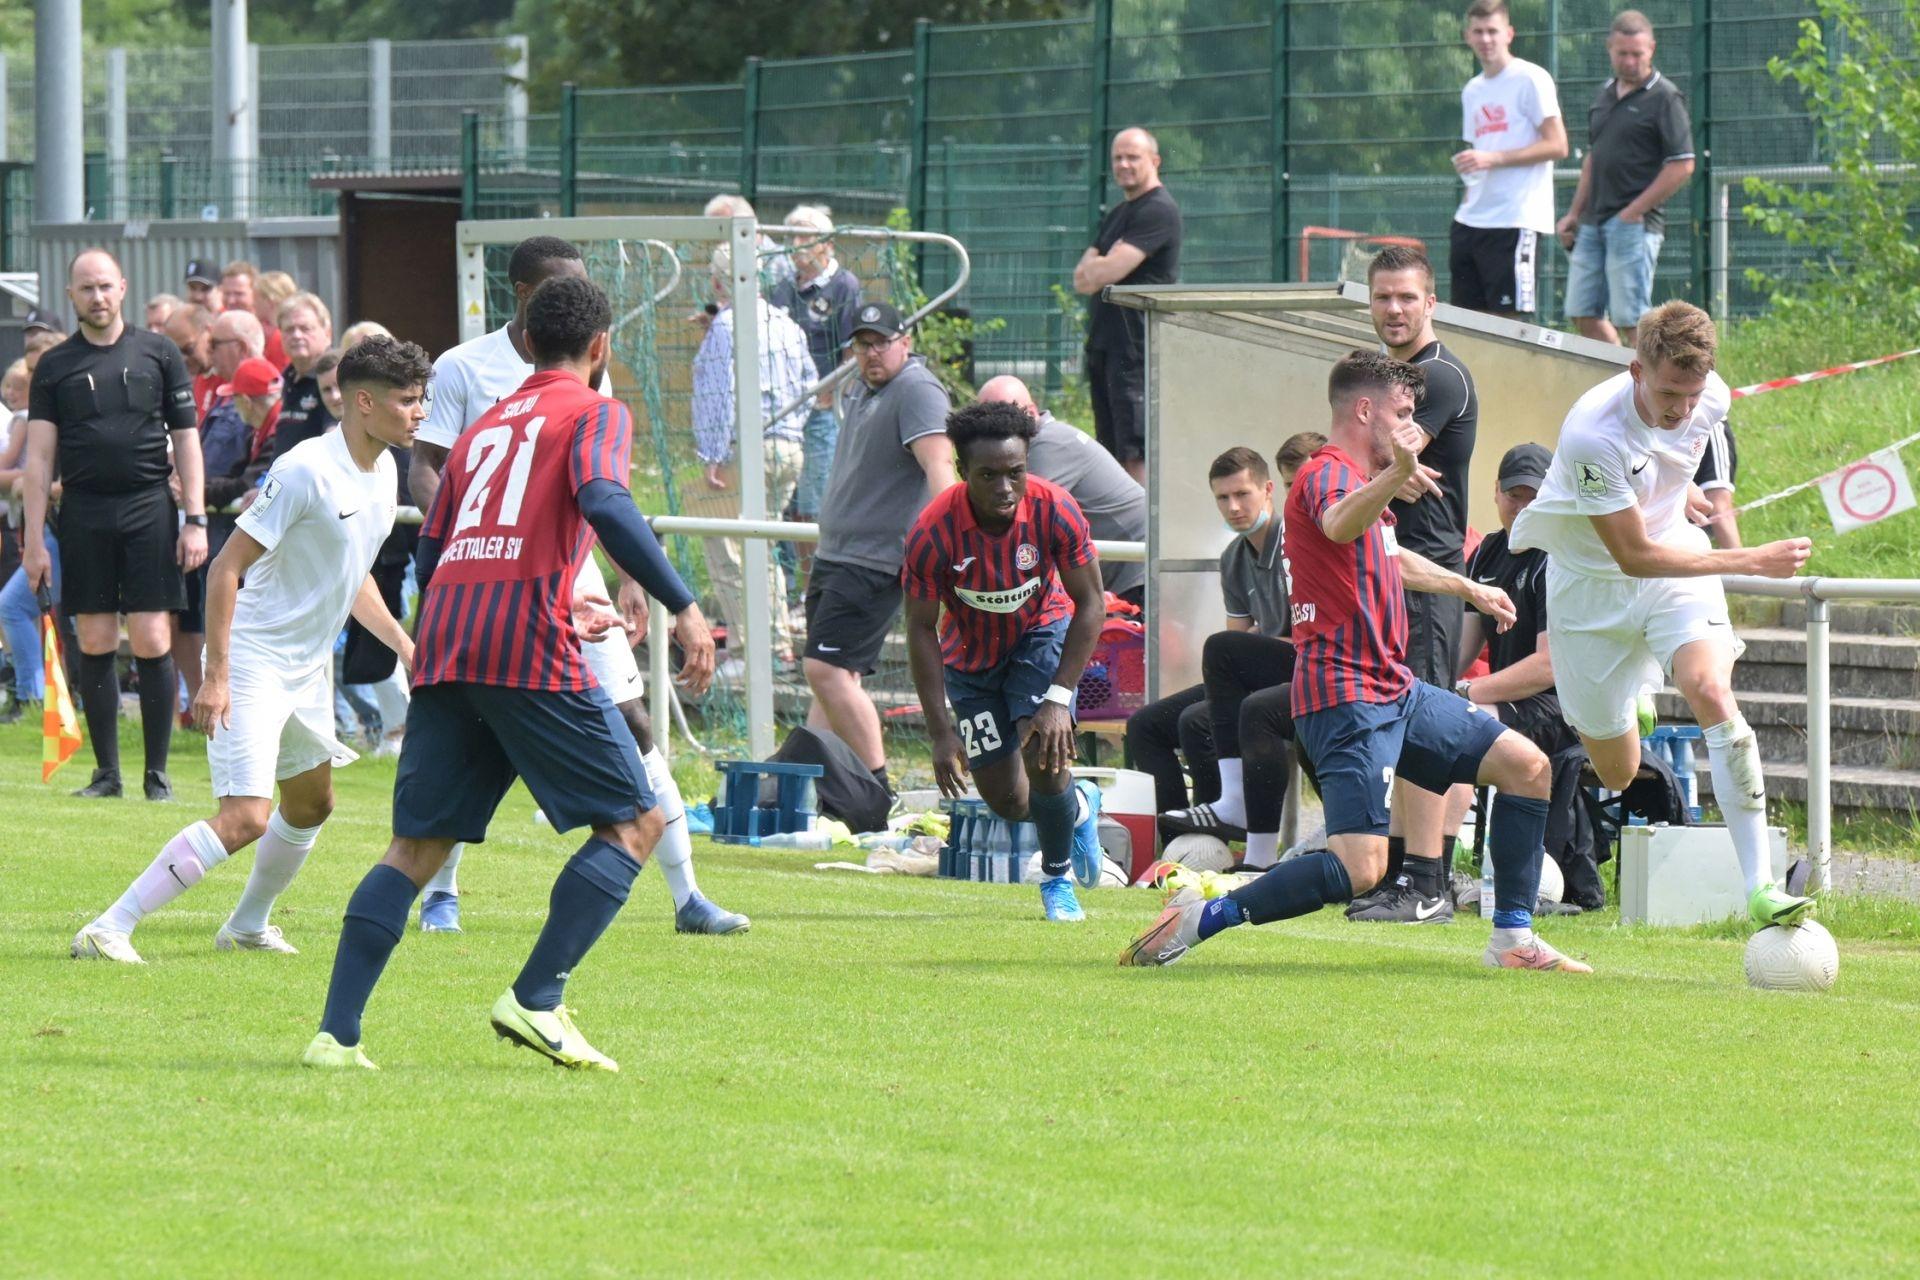 KSV Hessen Kassel, Wuppertaler SV, Endstand 4:0, Leonardo Zornio, Brian Schwechel